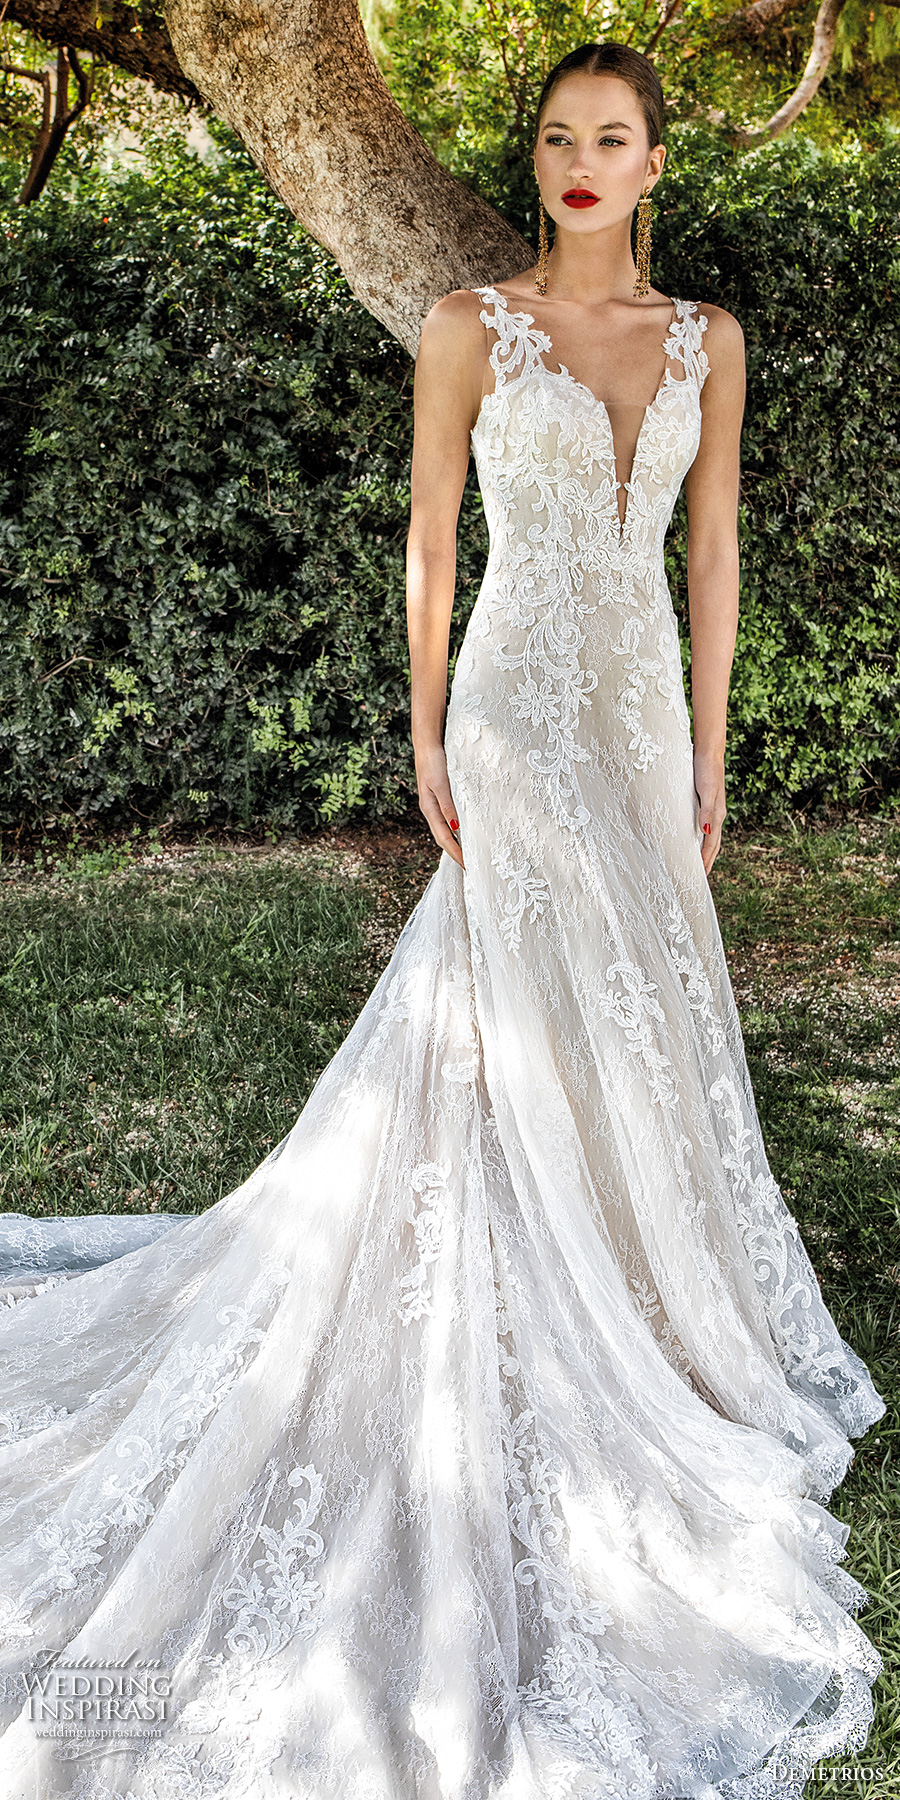 demetrios 2020 bridal sleeveless with strap deep plunging sweetheart neckline heavily embellished bodice elegant a  line wedding dress backless scoop back chapel train (11) lv